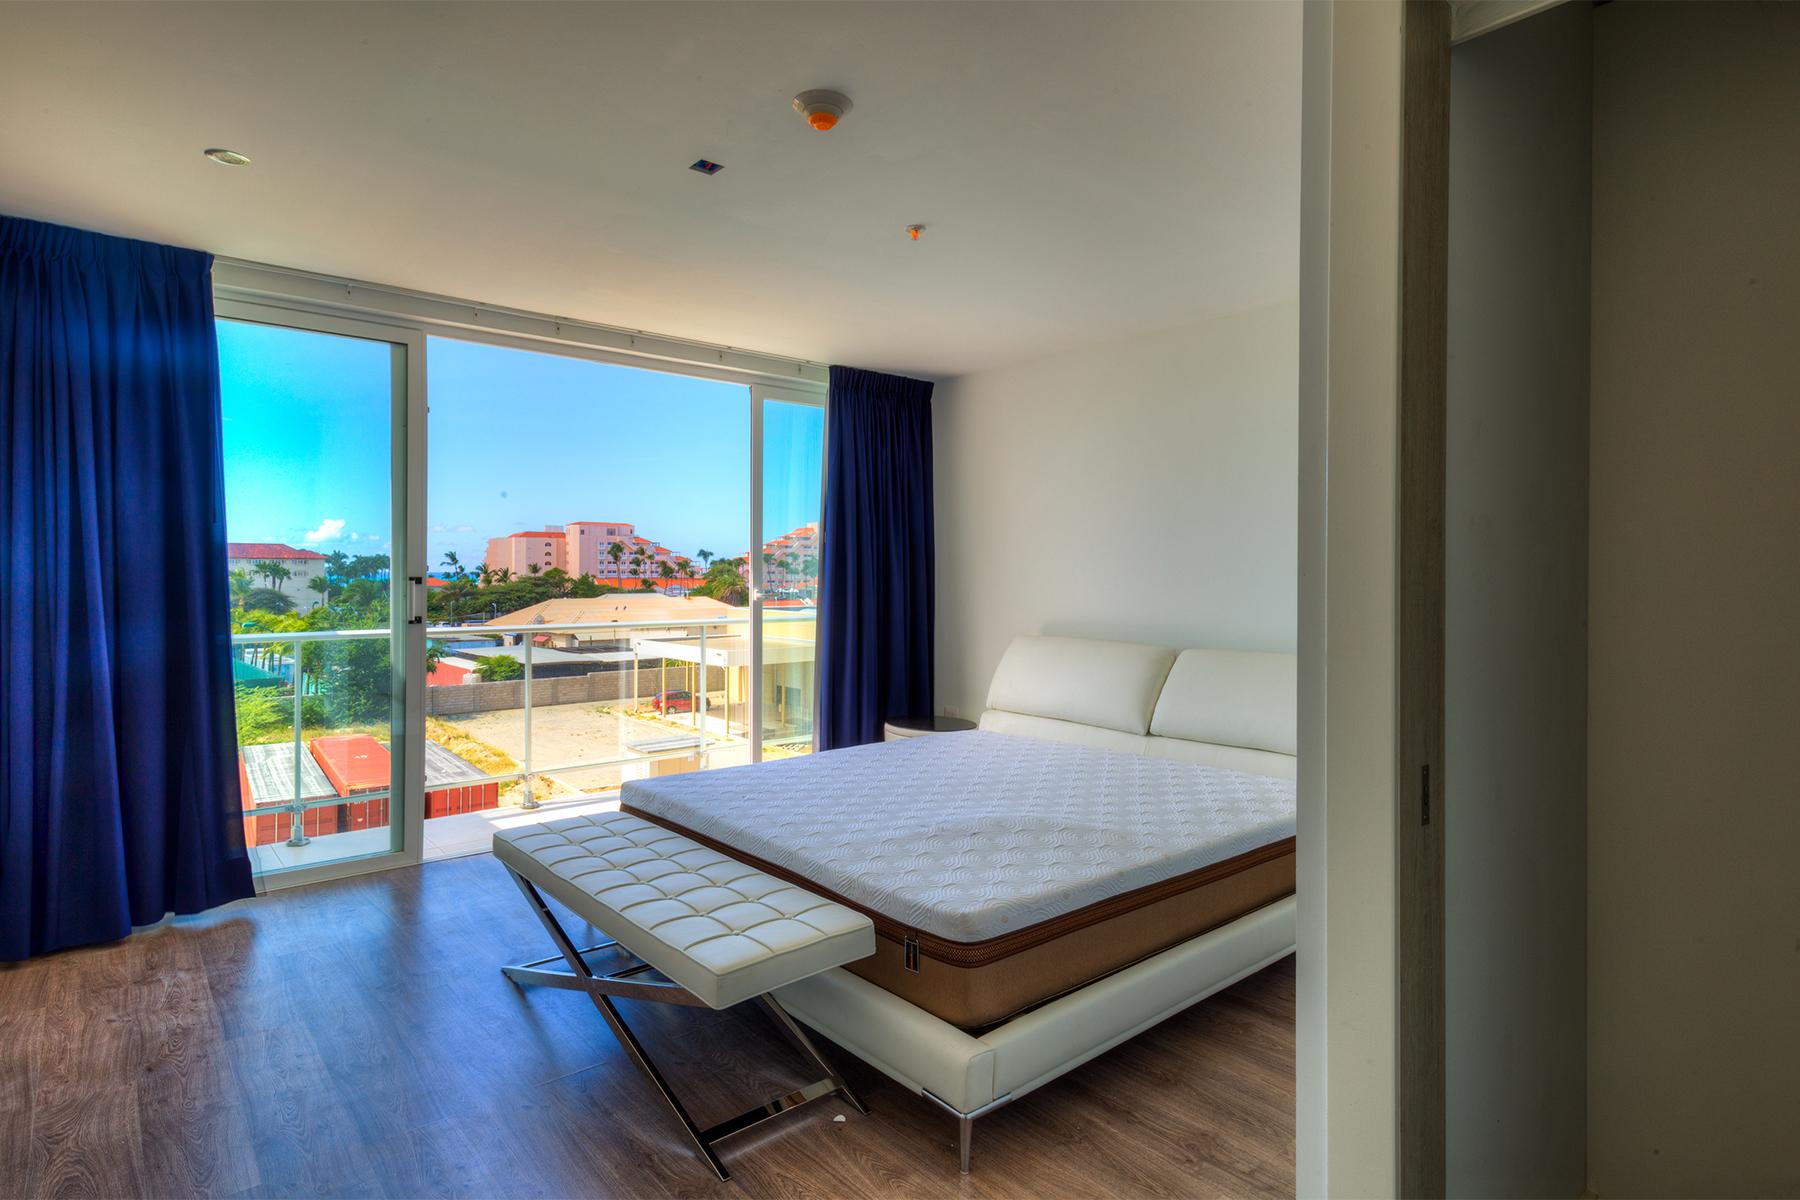 Condominium for Sale at Las Islas Residences Other Aruba, Aruba